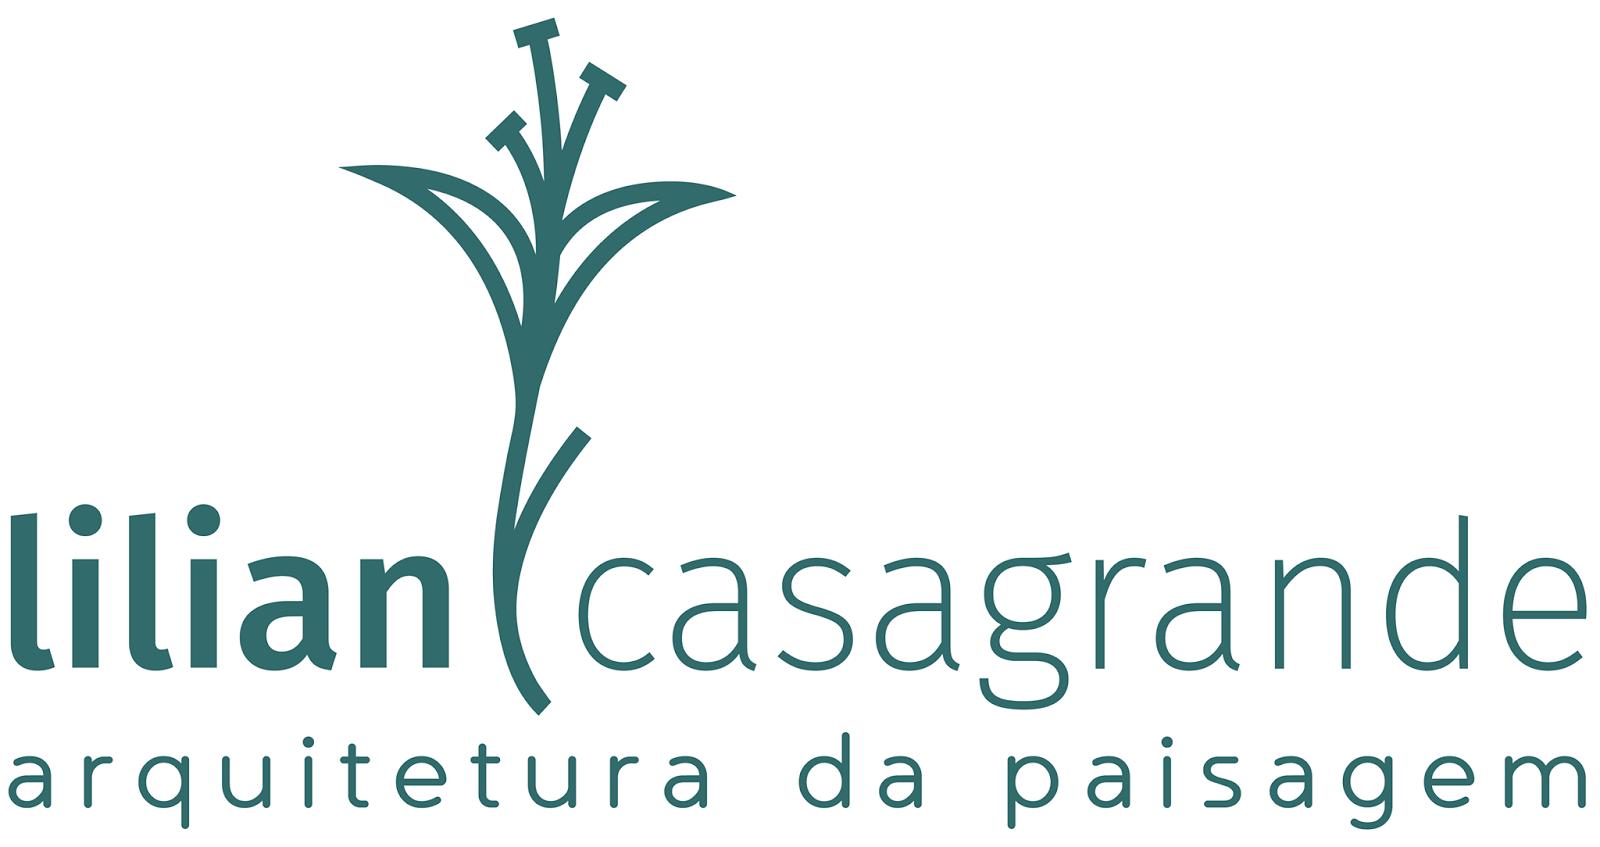 Lilian Casagrande Arquitetura da Paisagem